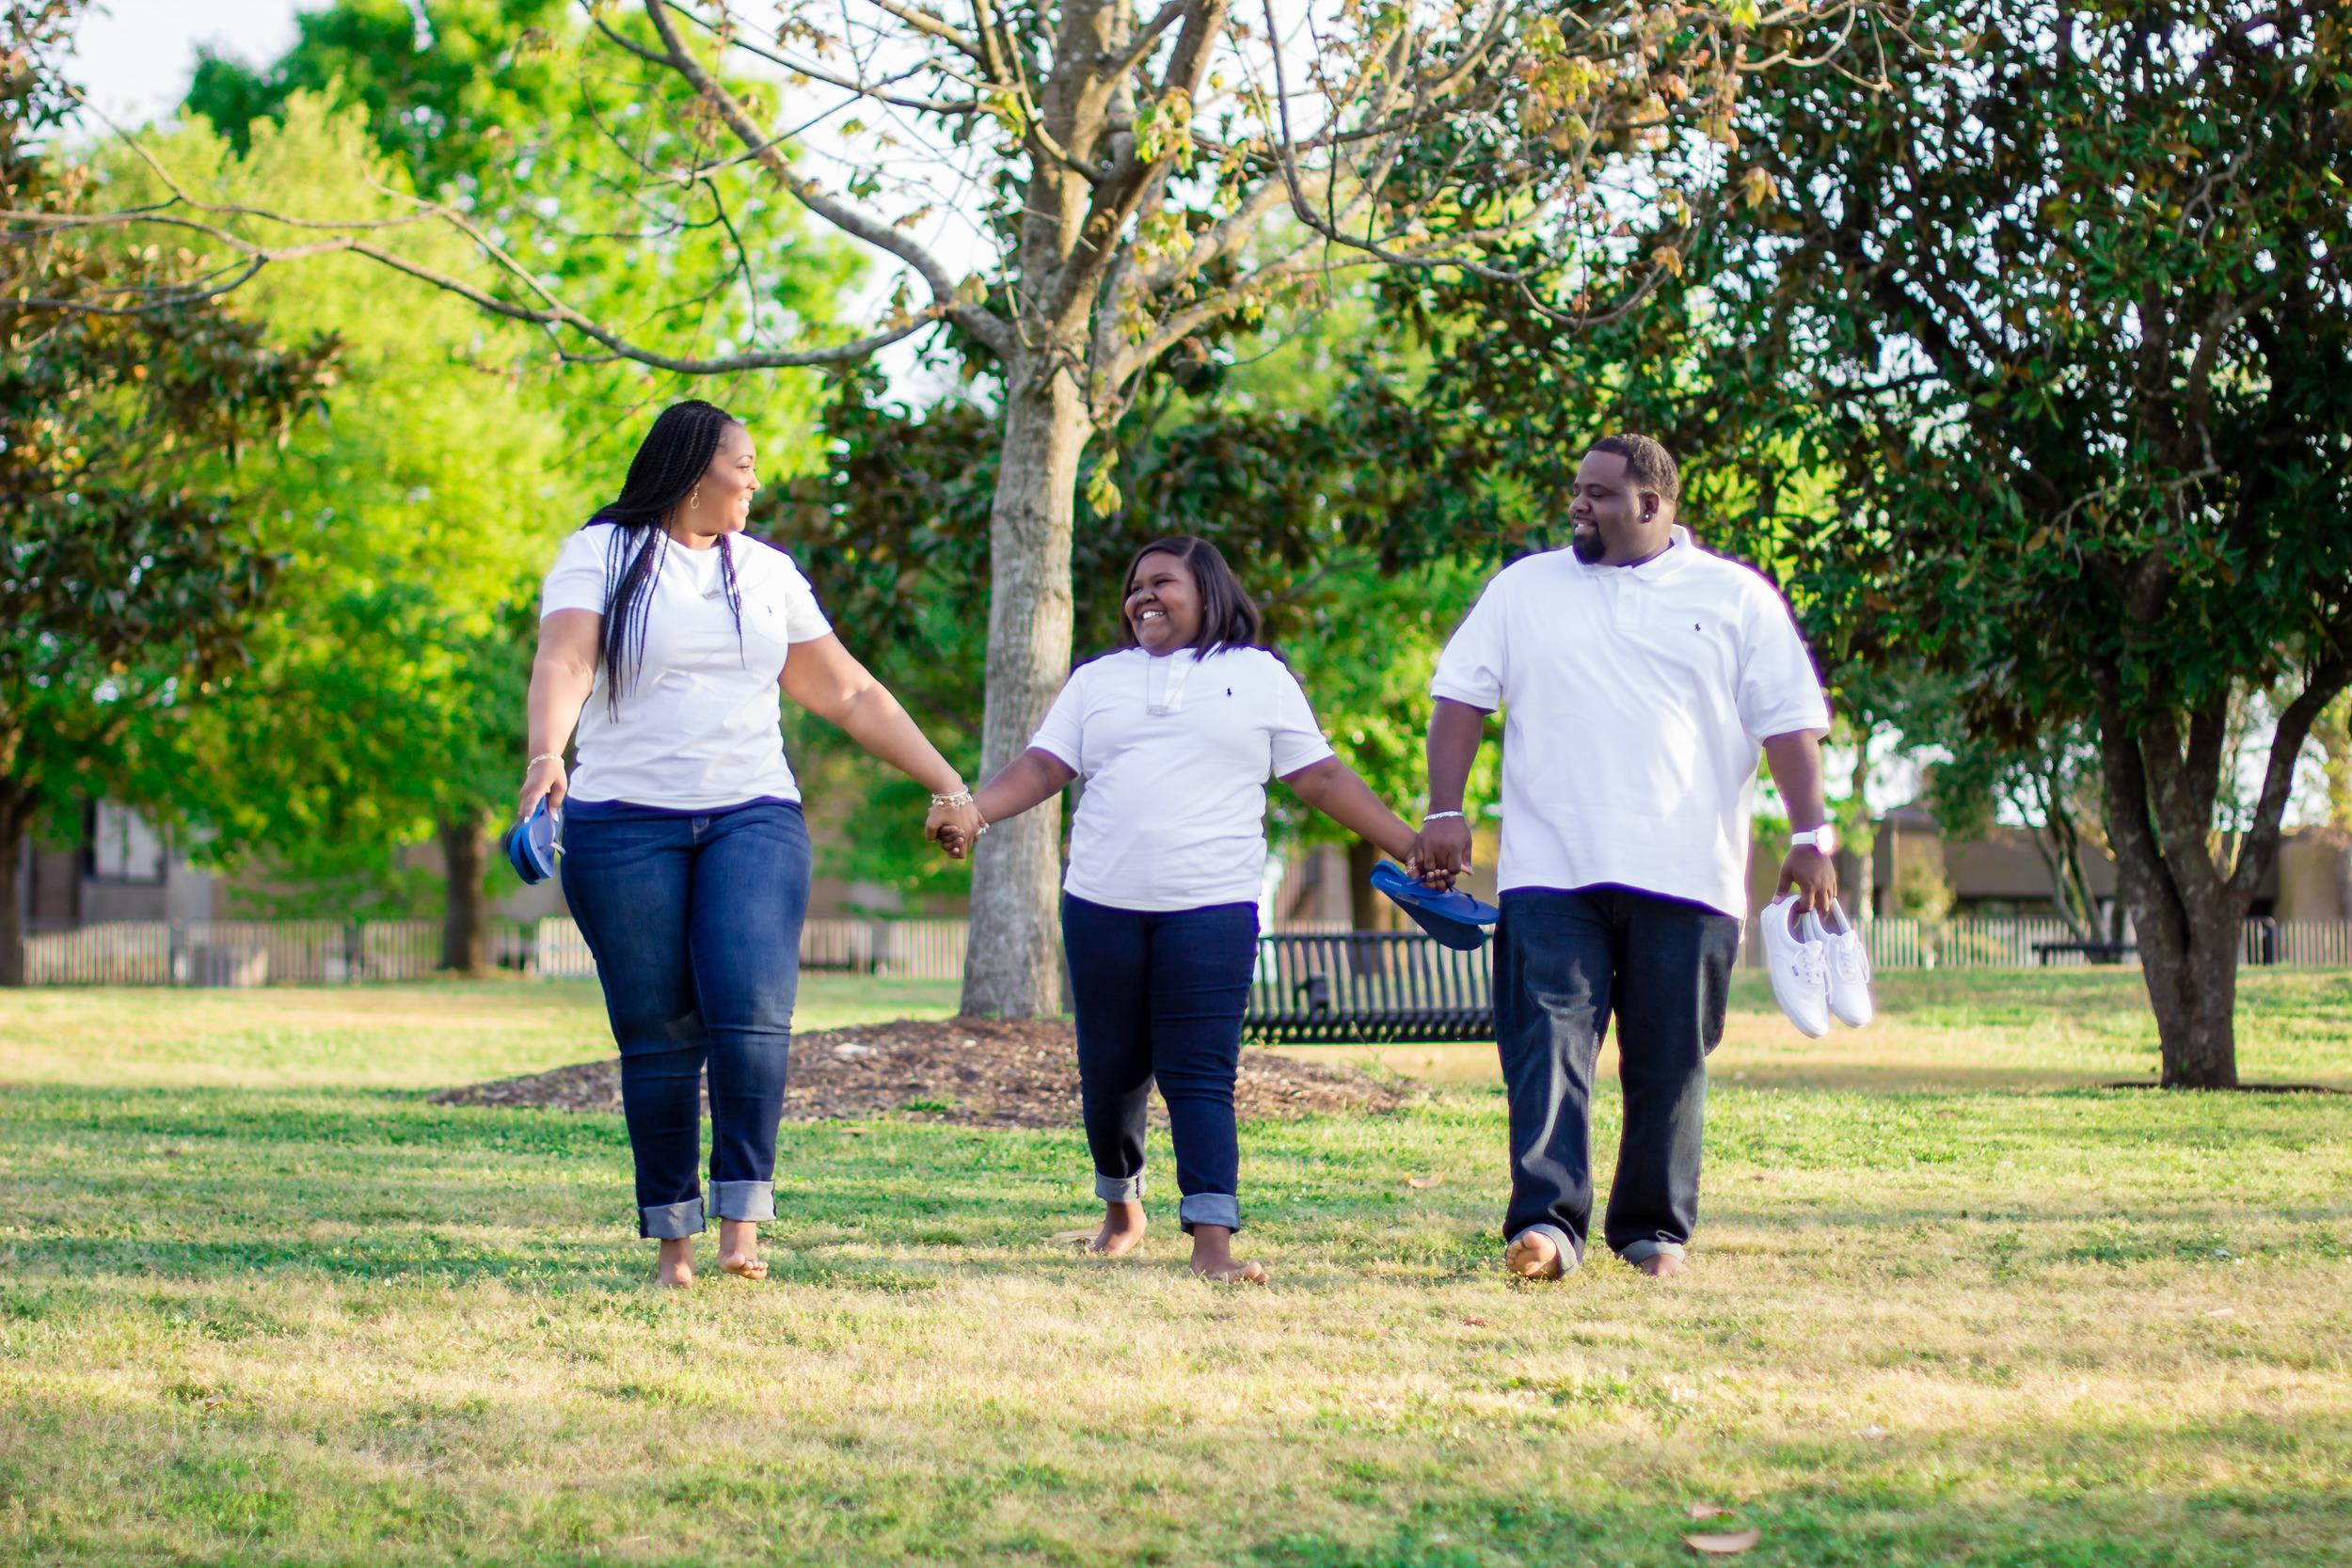 Eastern NC Family Portrait Photography | Tonya Smith 2016 | Reviews + Testimonials